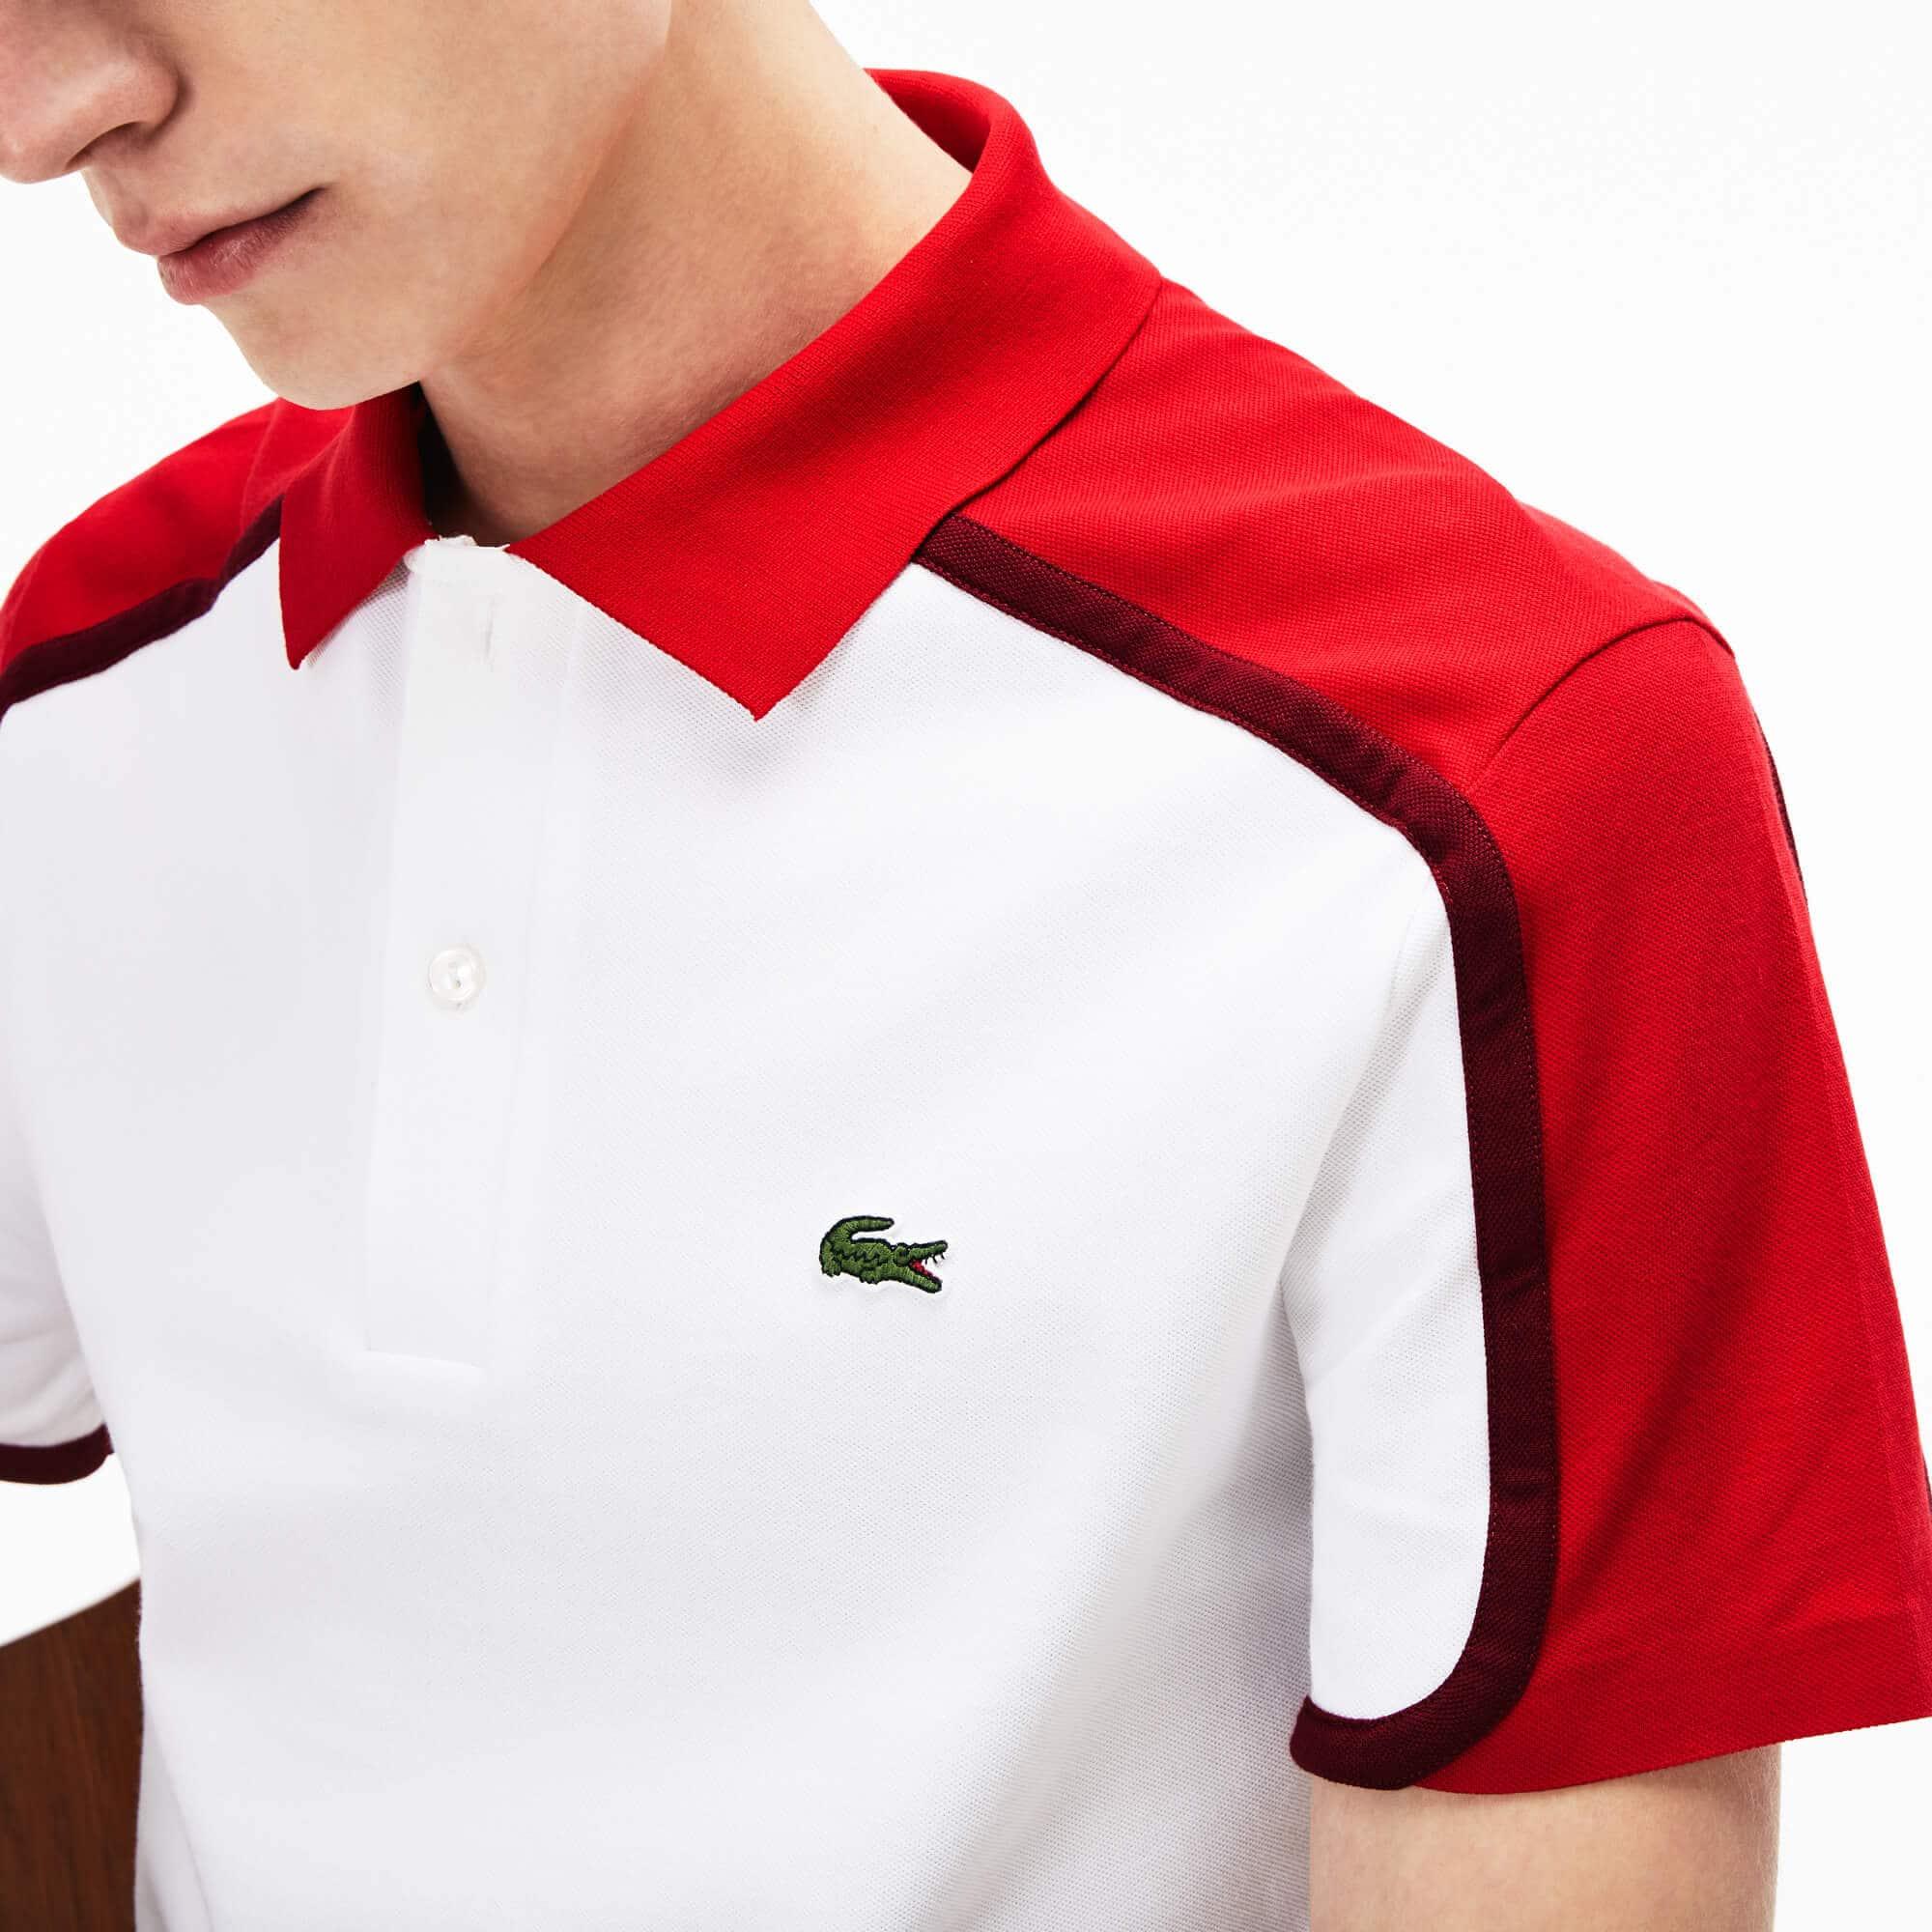 0593a84dbe8009 Men s Lacoste Made in France Slim Fit Colourblock Piqué Polo Shirt ...